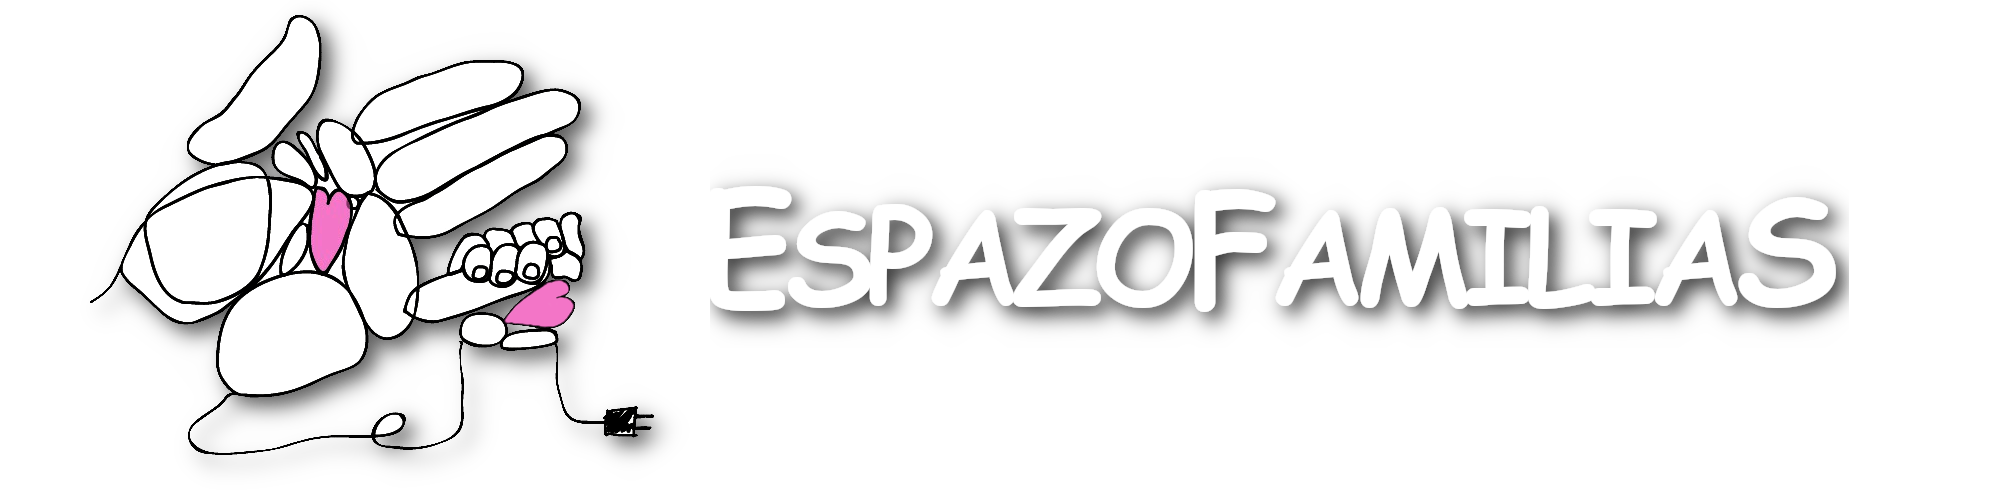 EspazoFamiliaS